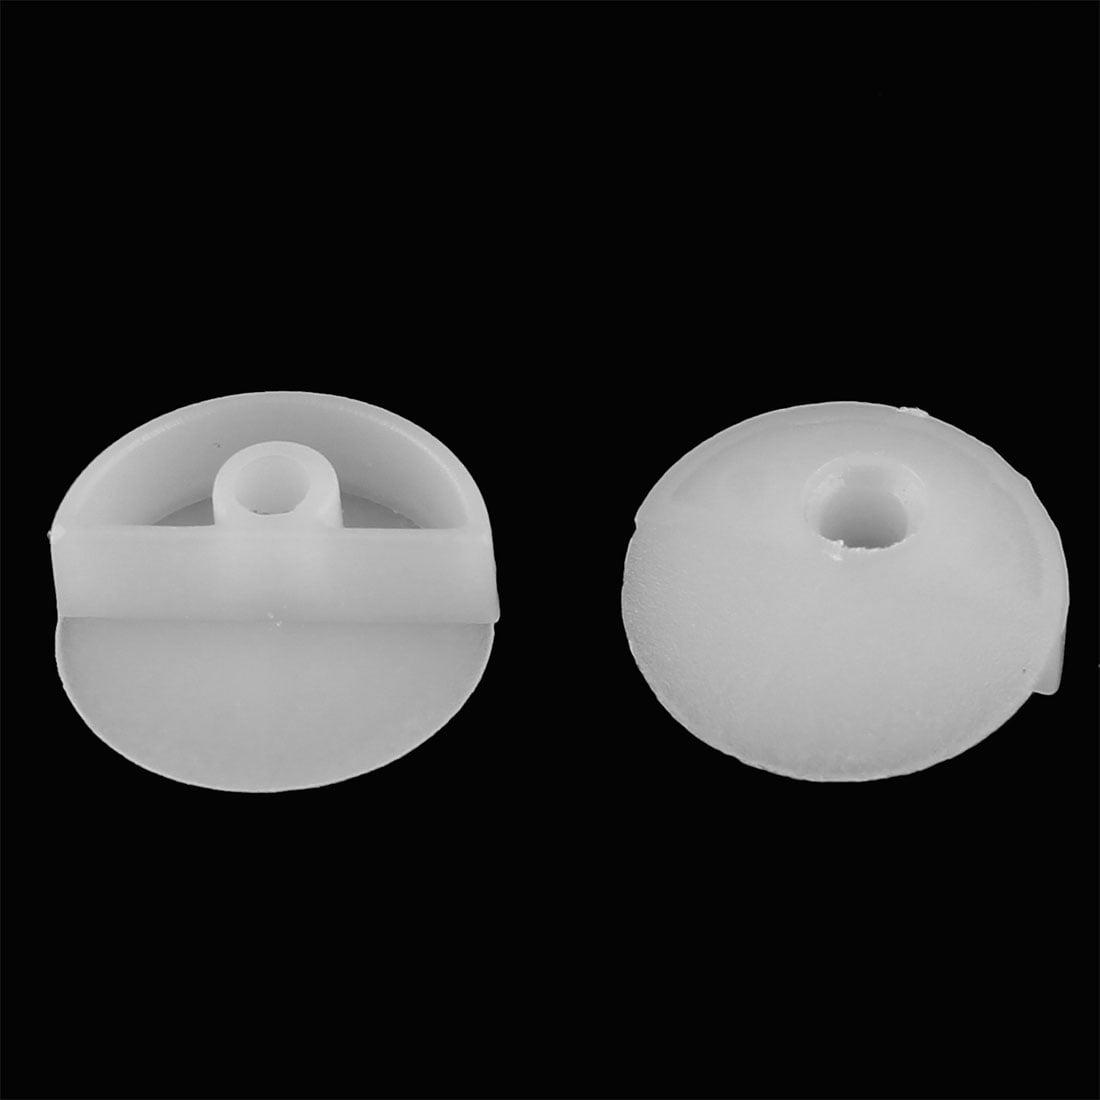 Furniture Mirror Corner Button Angle Buckle 180 Degree 6mm Thickness 20pcs - image 1 de 2